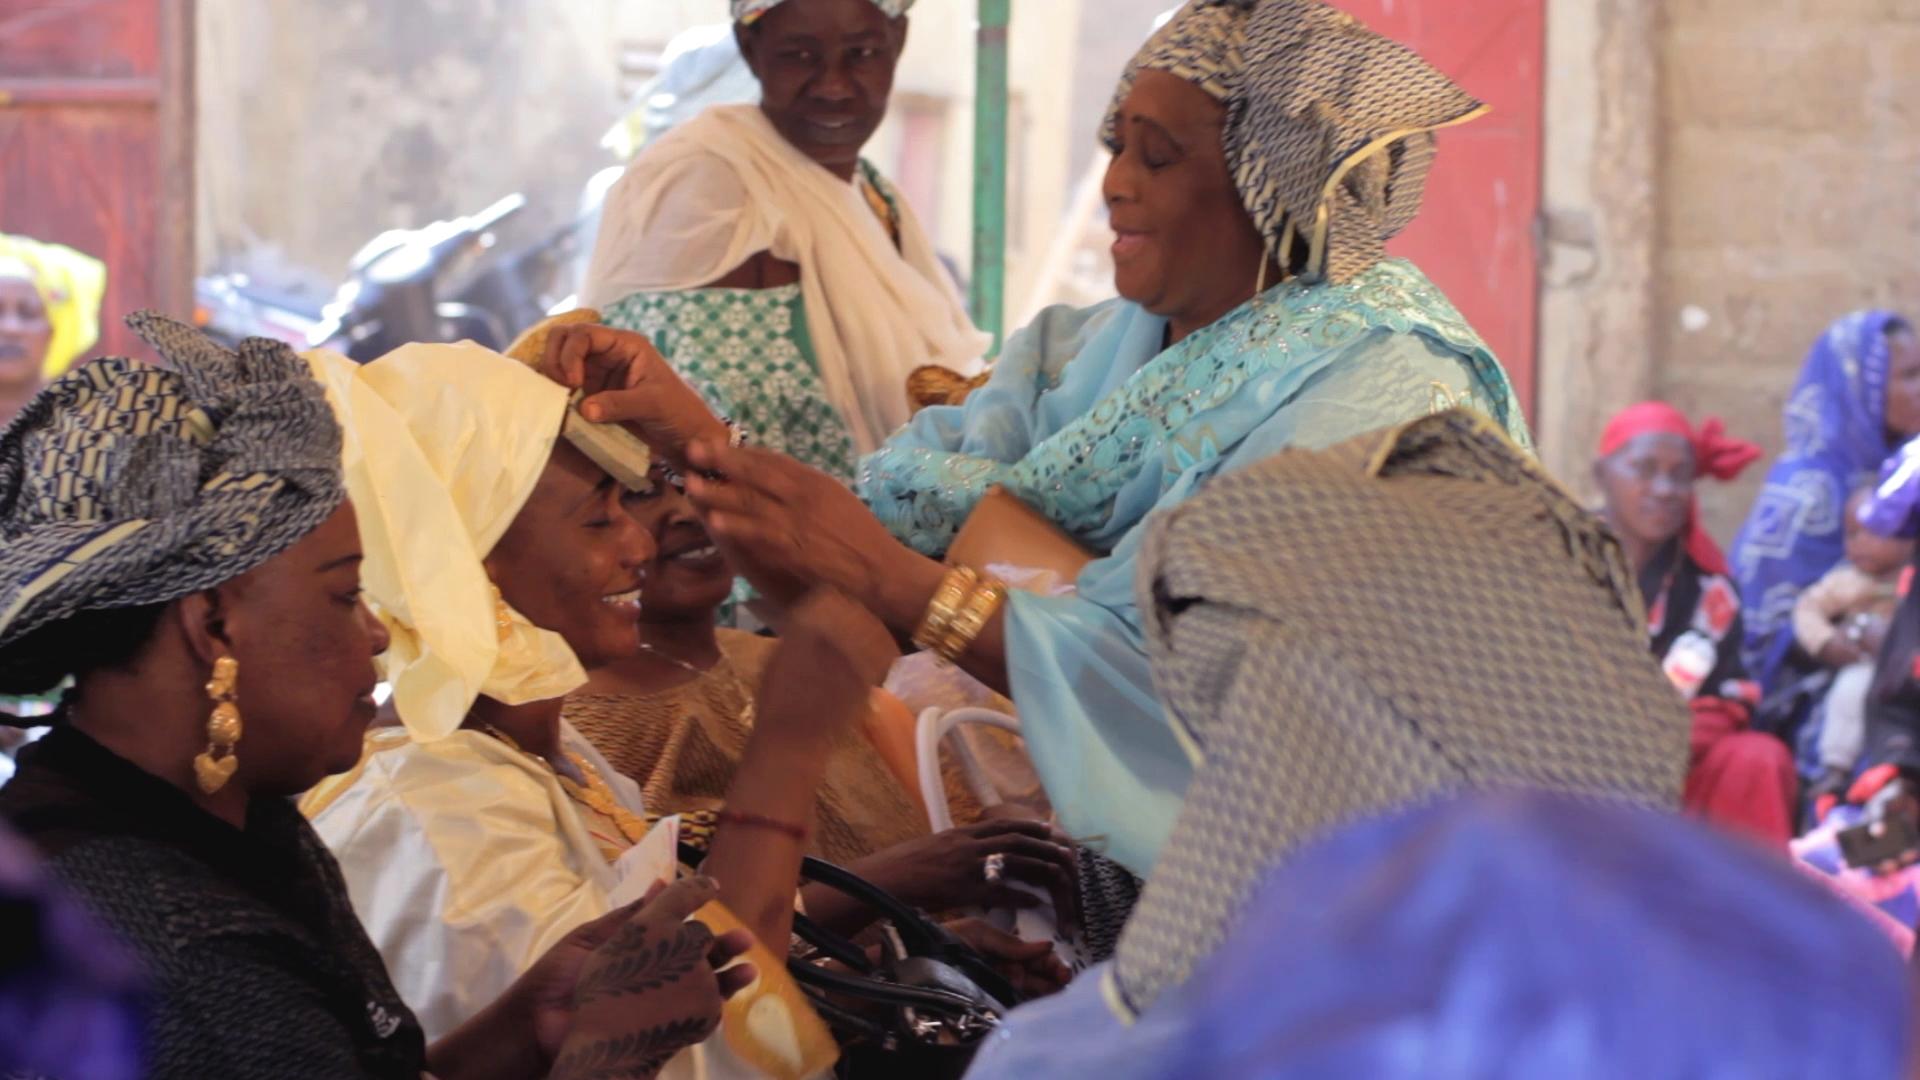 ofrendas billete casamiento mali pablocaminante - Malí 3, Ségou